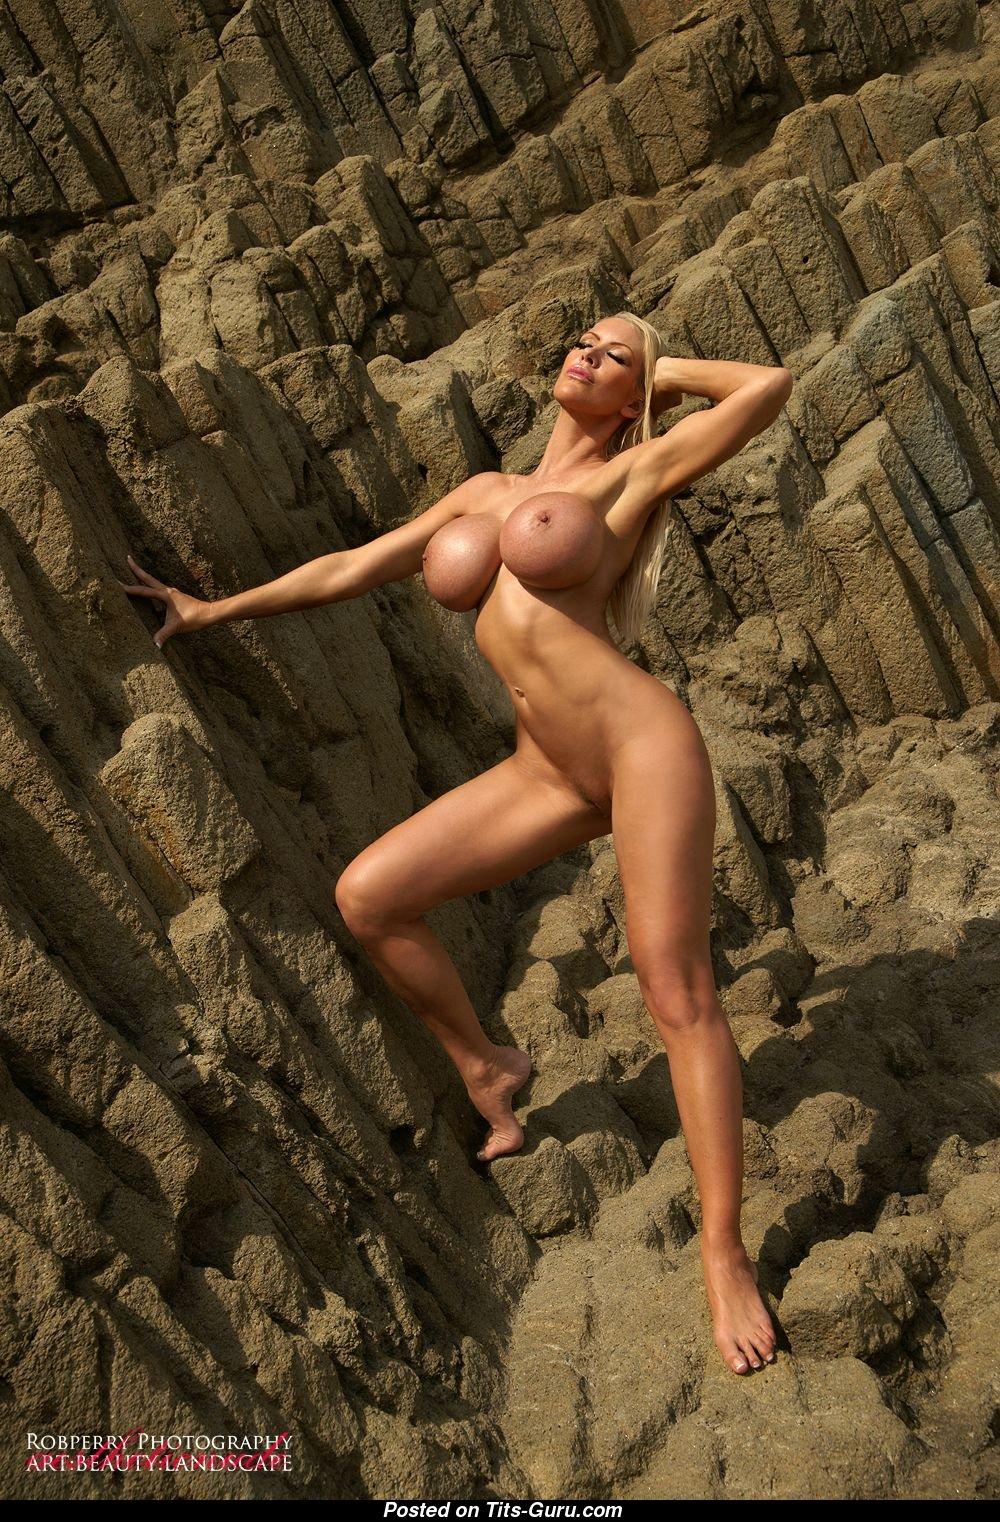 Amazon Nude Pic tania amazon nude 🌶️ 4 pics of hot naked boobs